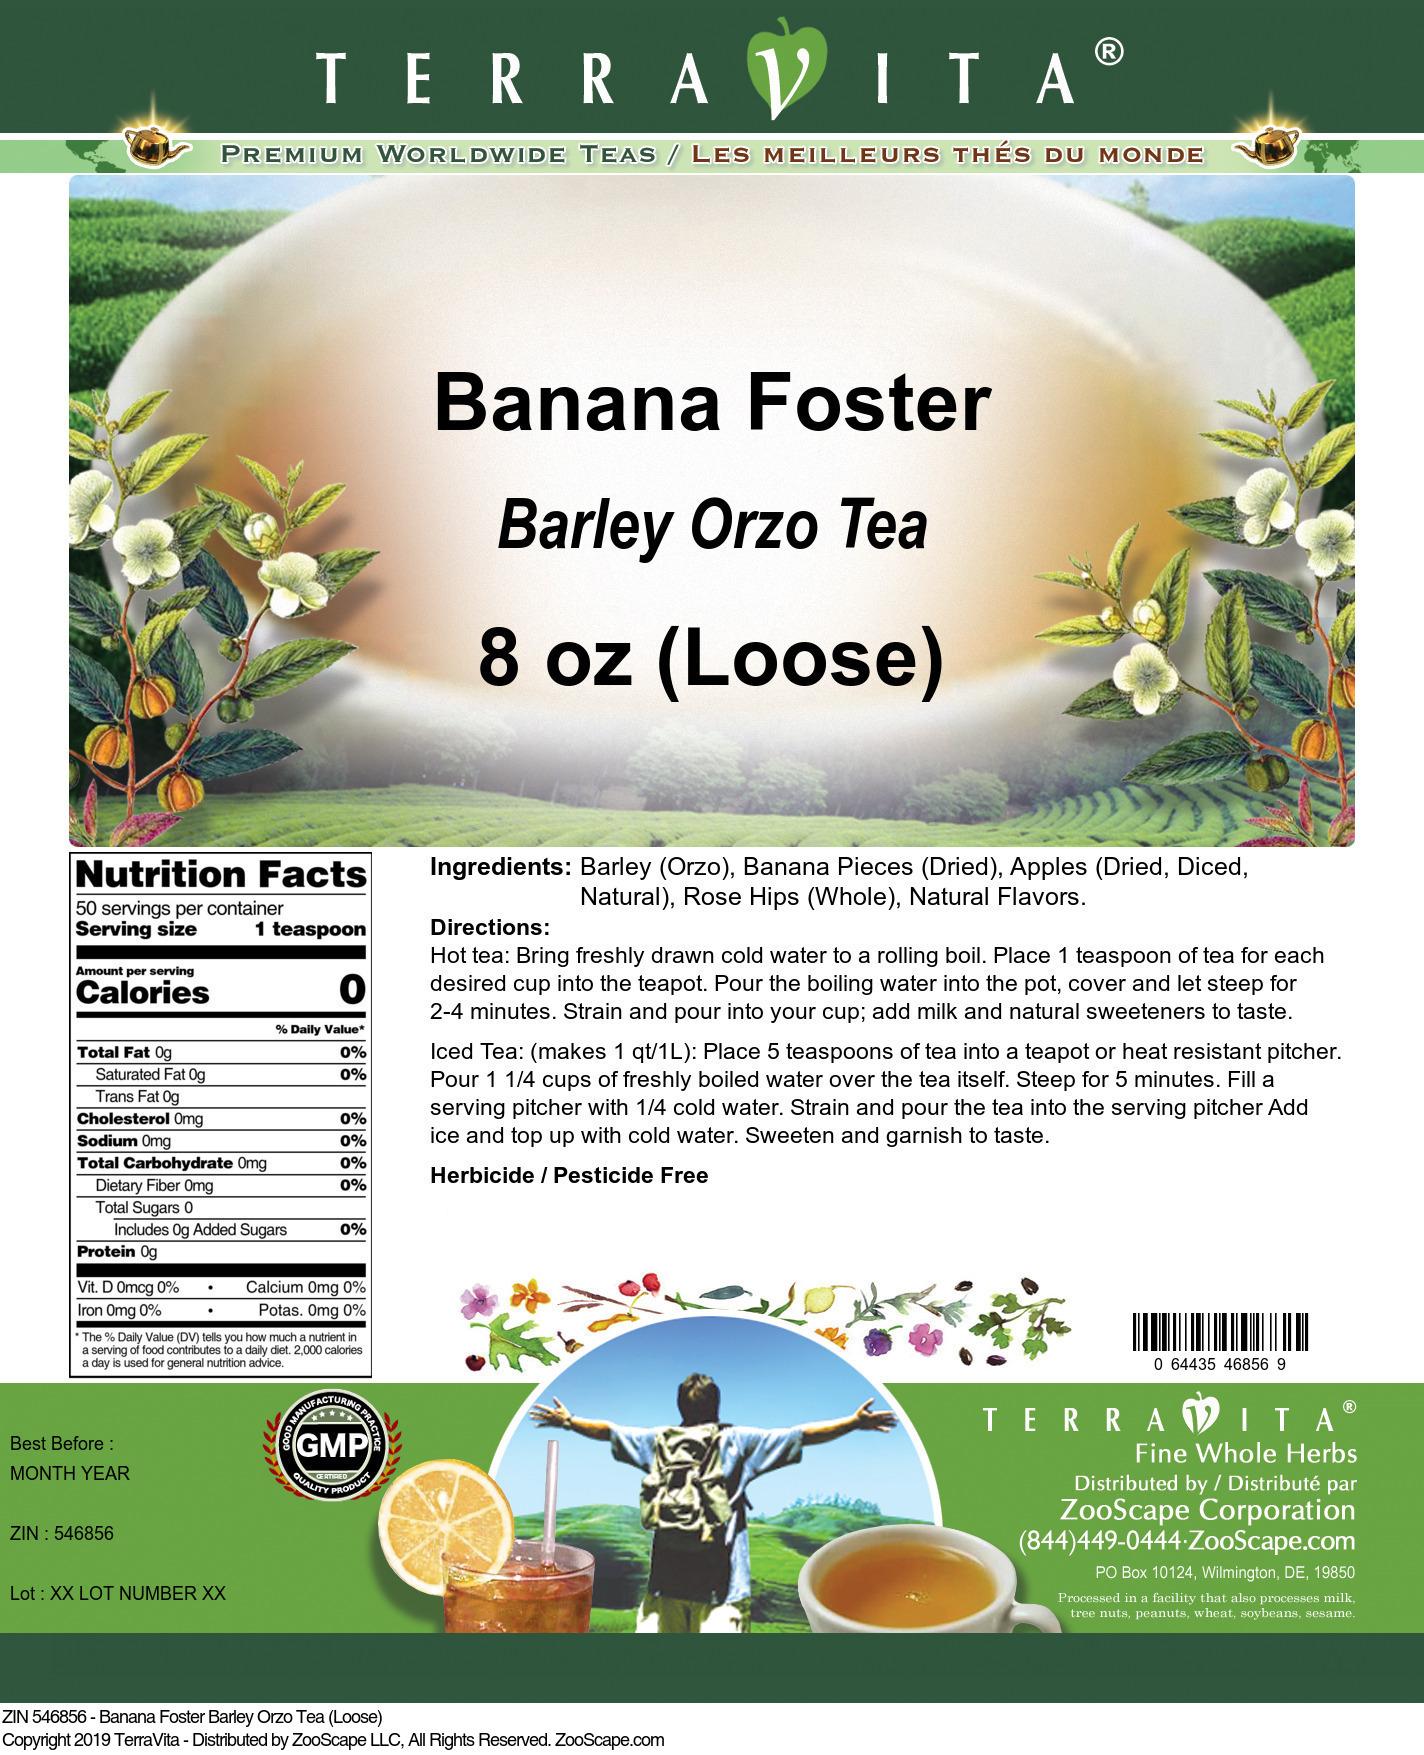 Banana Foster Barley Orzo Tea (Loose)